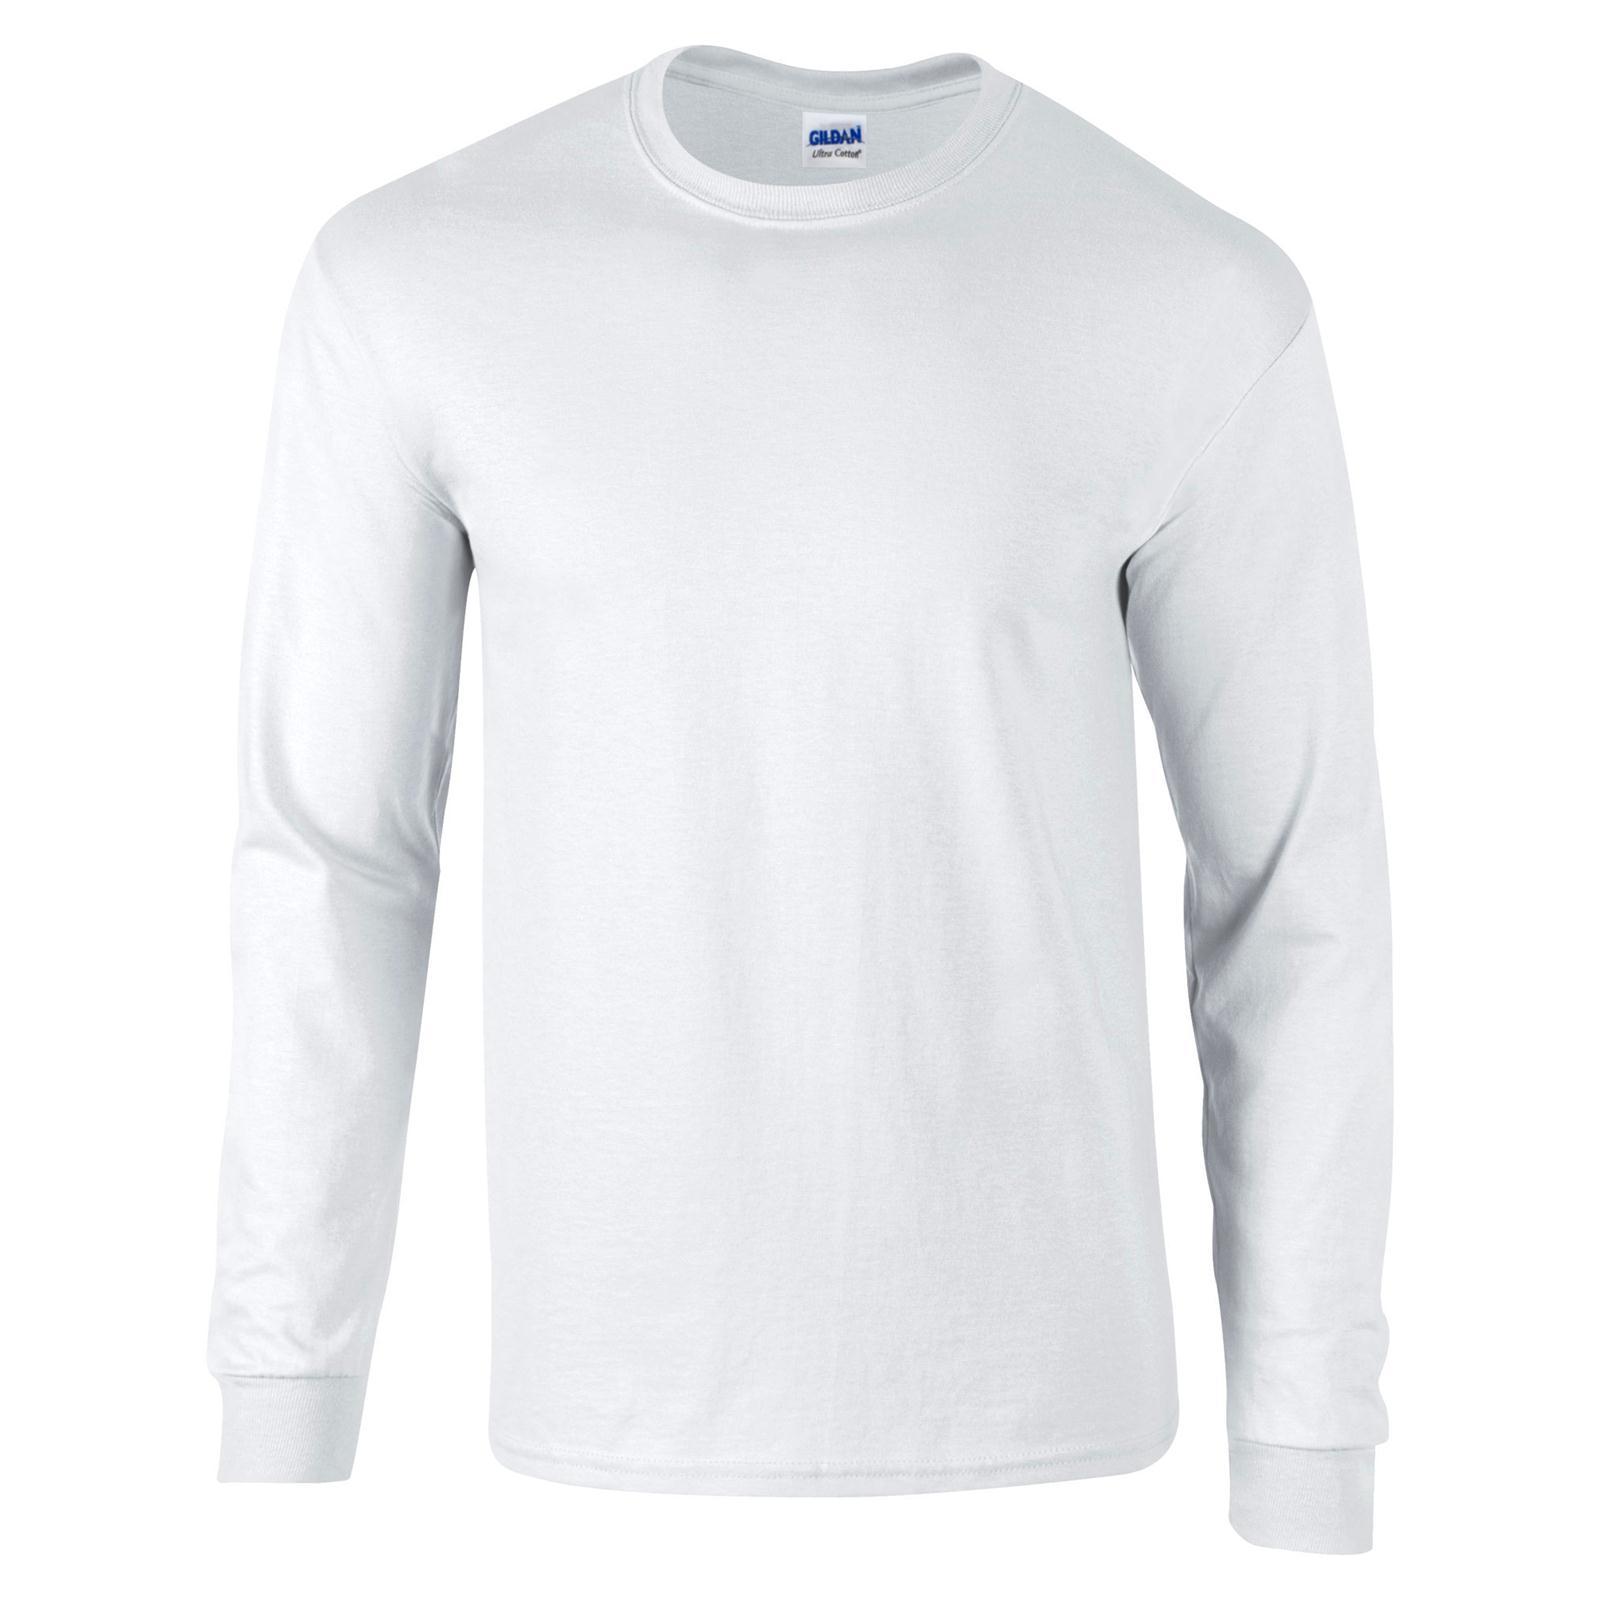 Nueva Camiseta GILDAN Unisex Adultos Ultra Algodón Manga Larga ... 59042ea942d